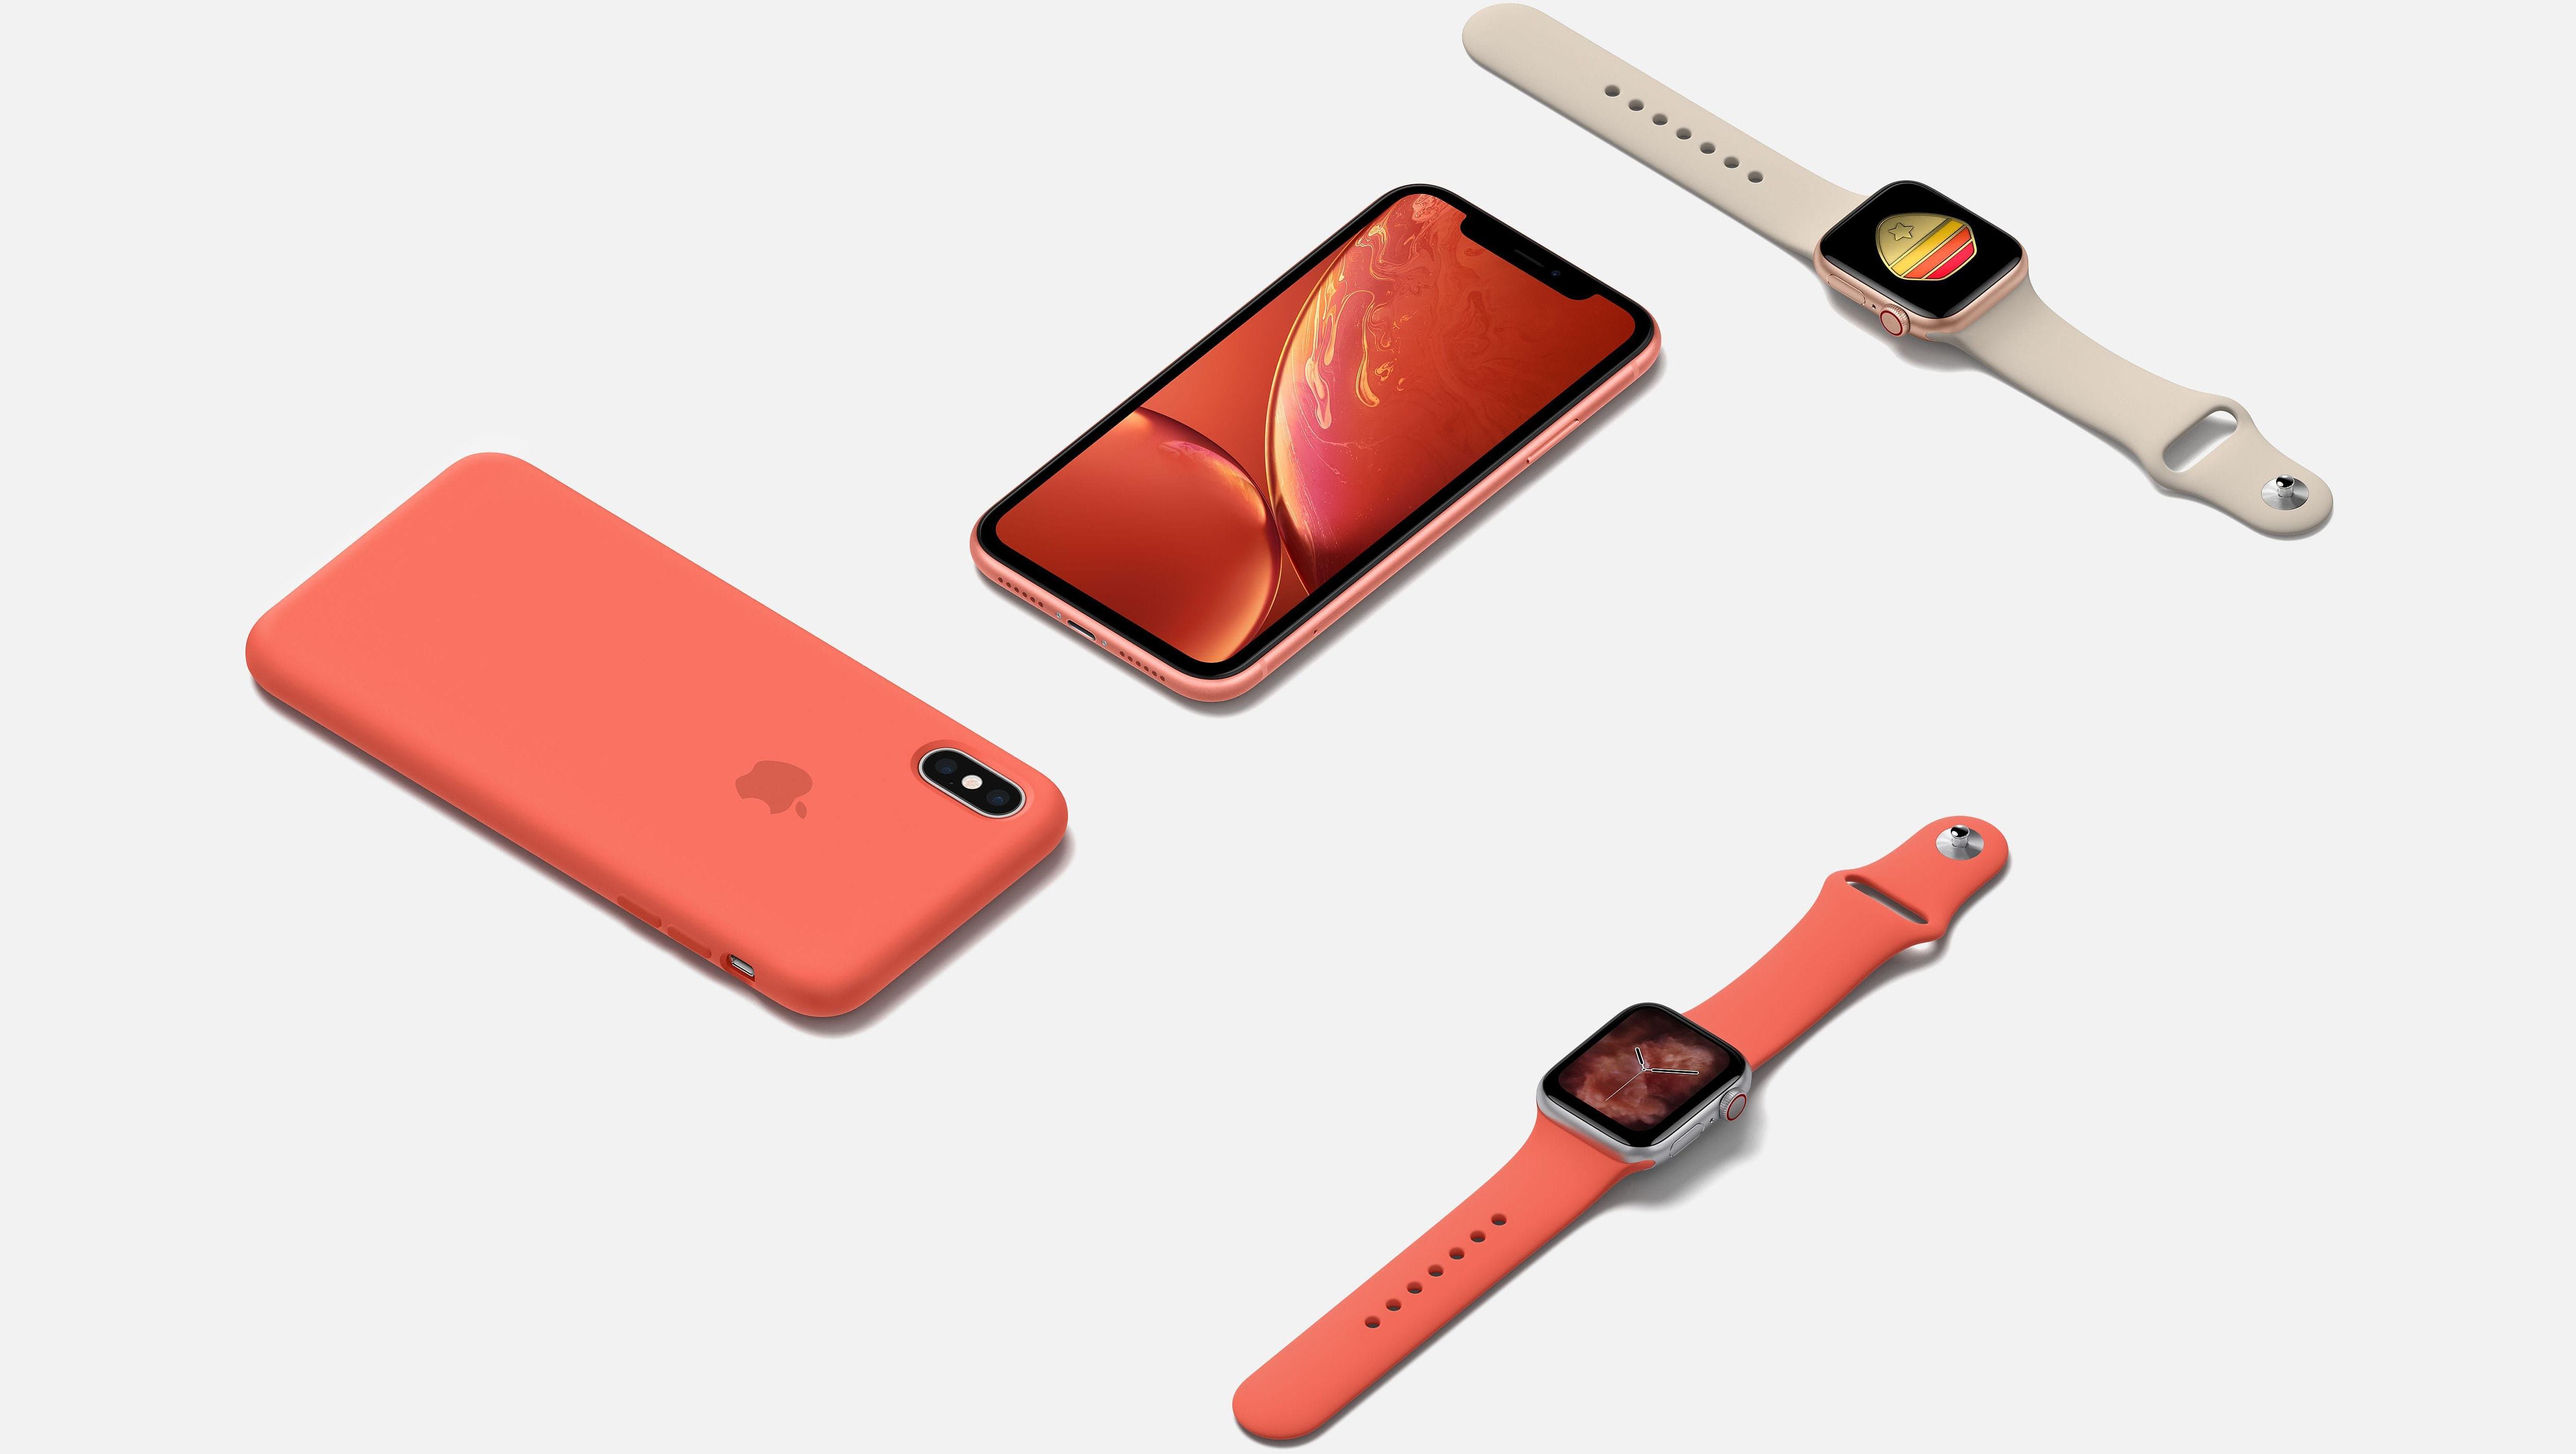 Produtos diversos da Apple em ângulo - iPhone XR rosa, iPhone XS com capa rosa e Apple Watch Series 4